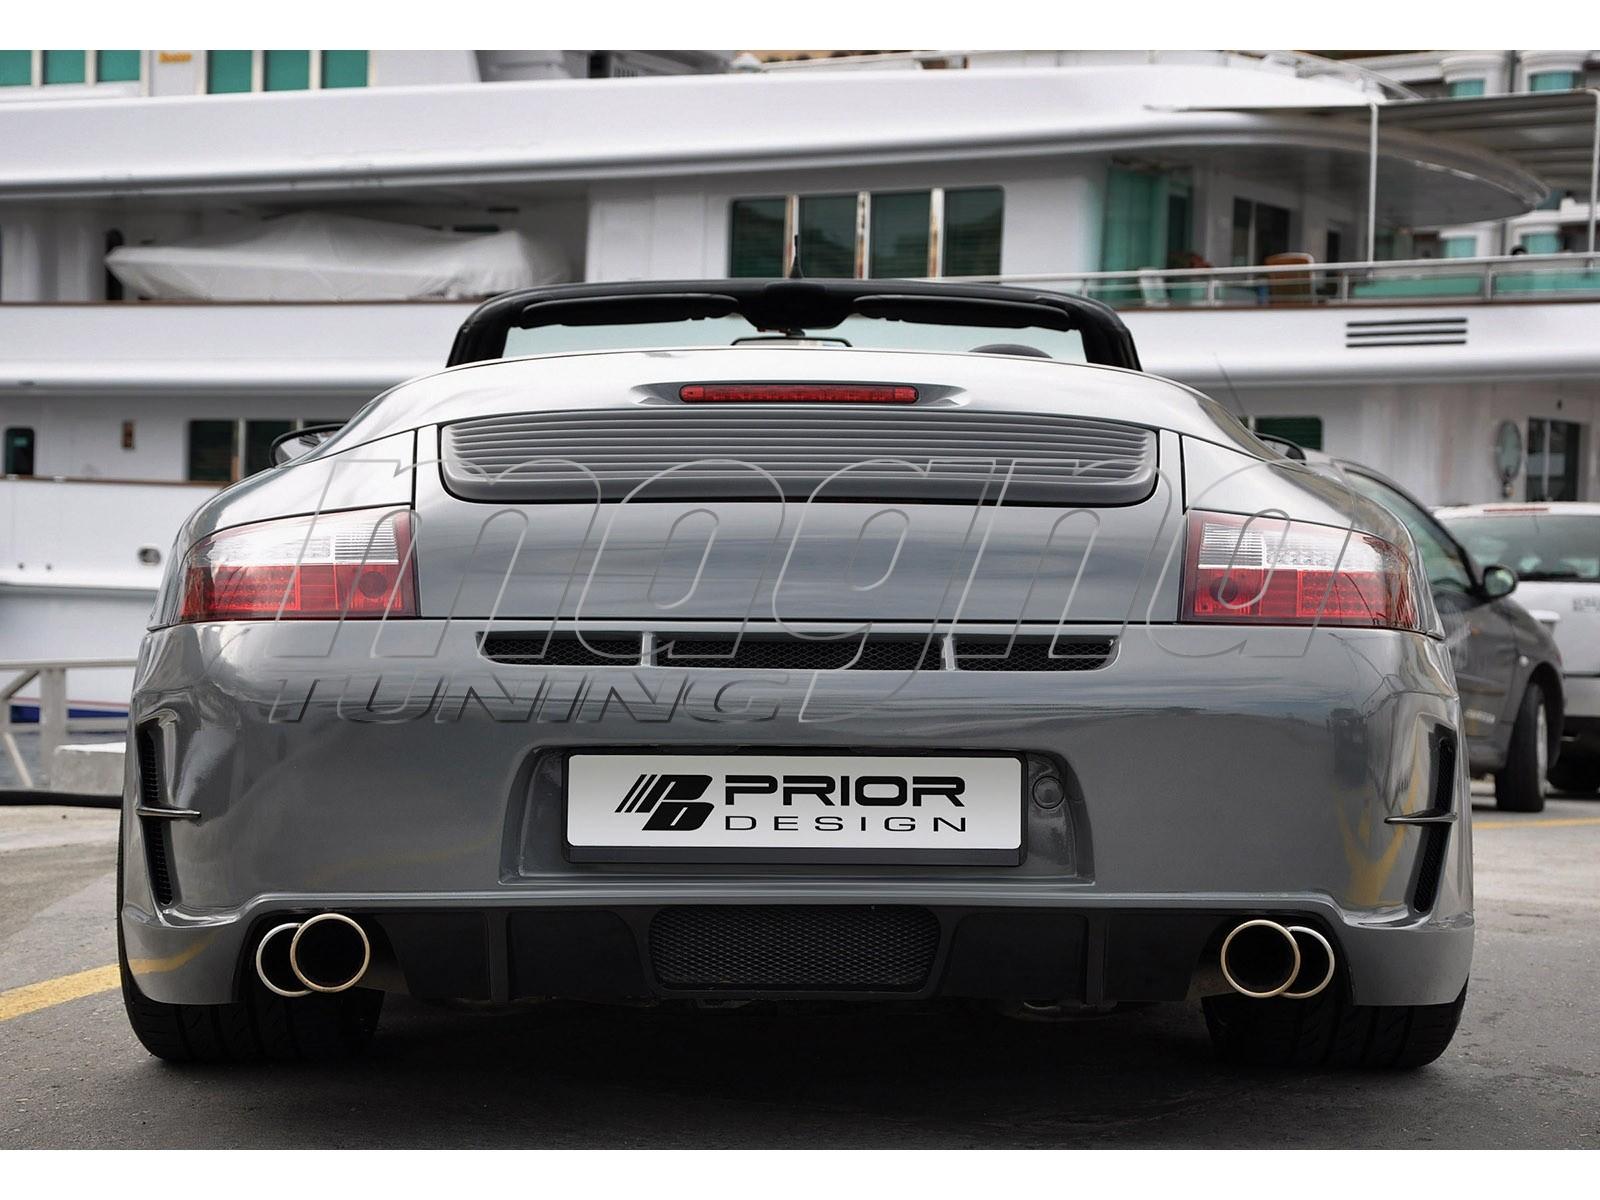 Porsche 911 / 996 Body Kit 997-Look